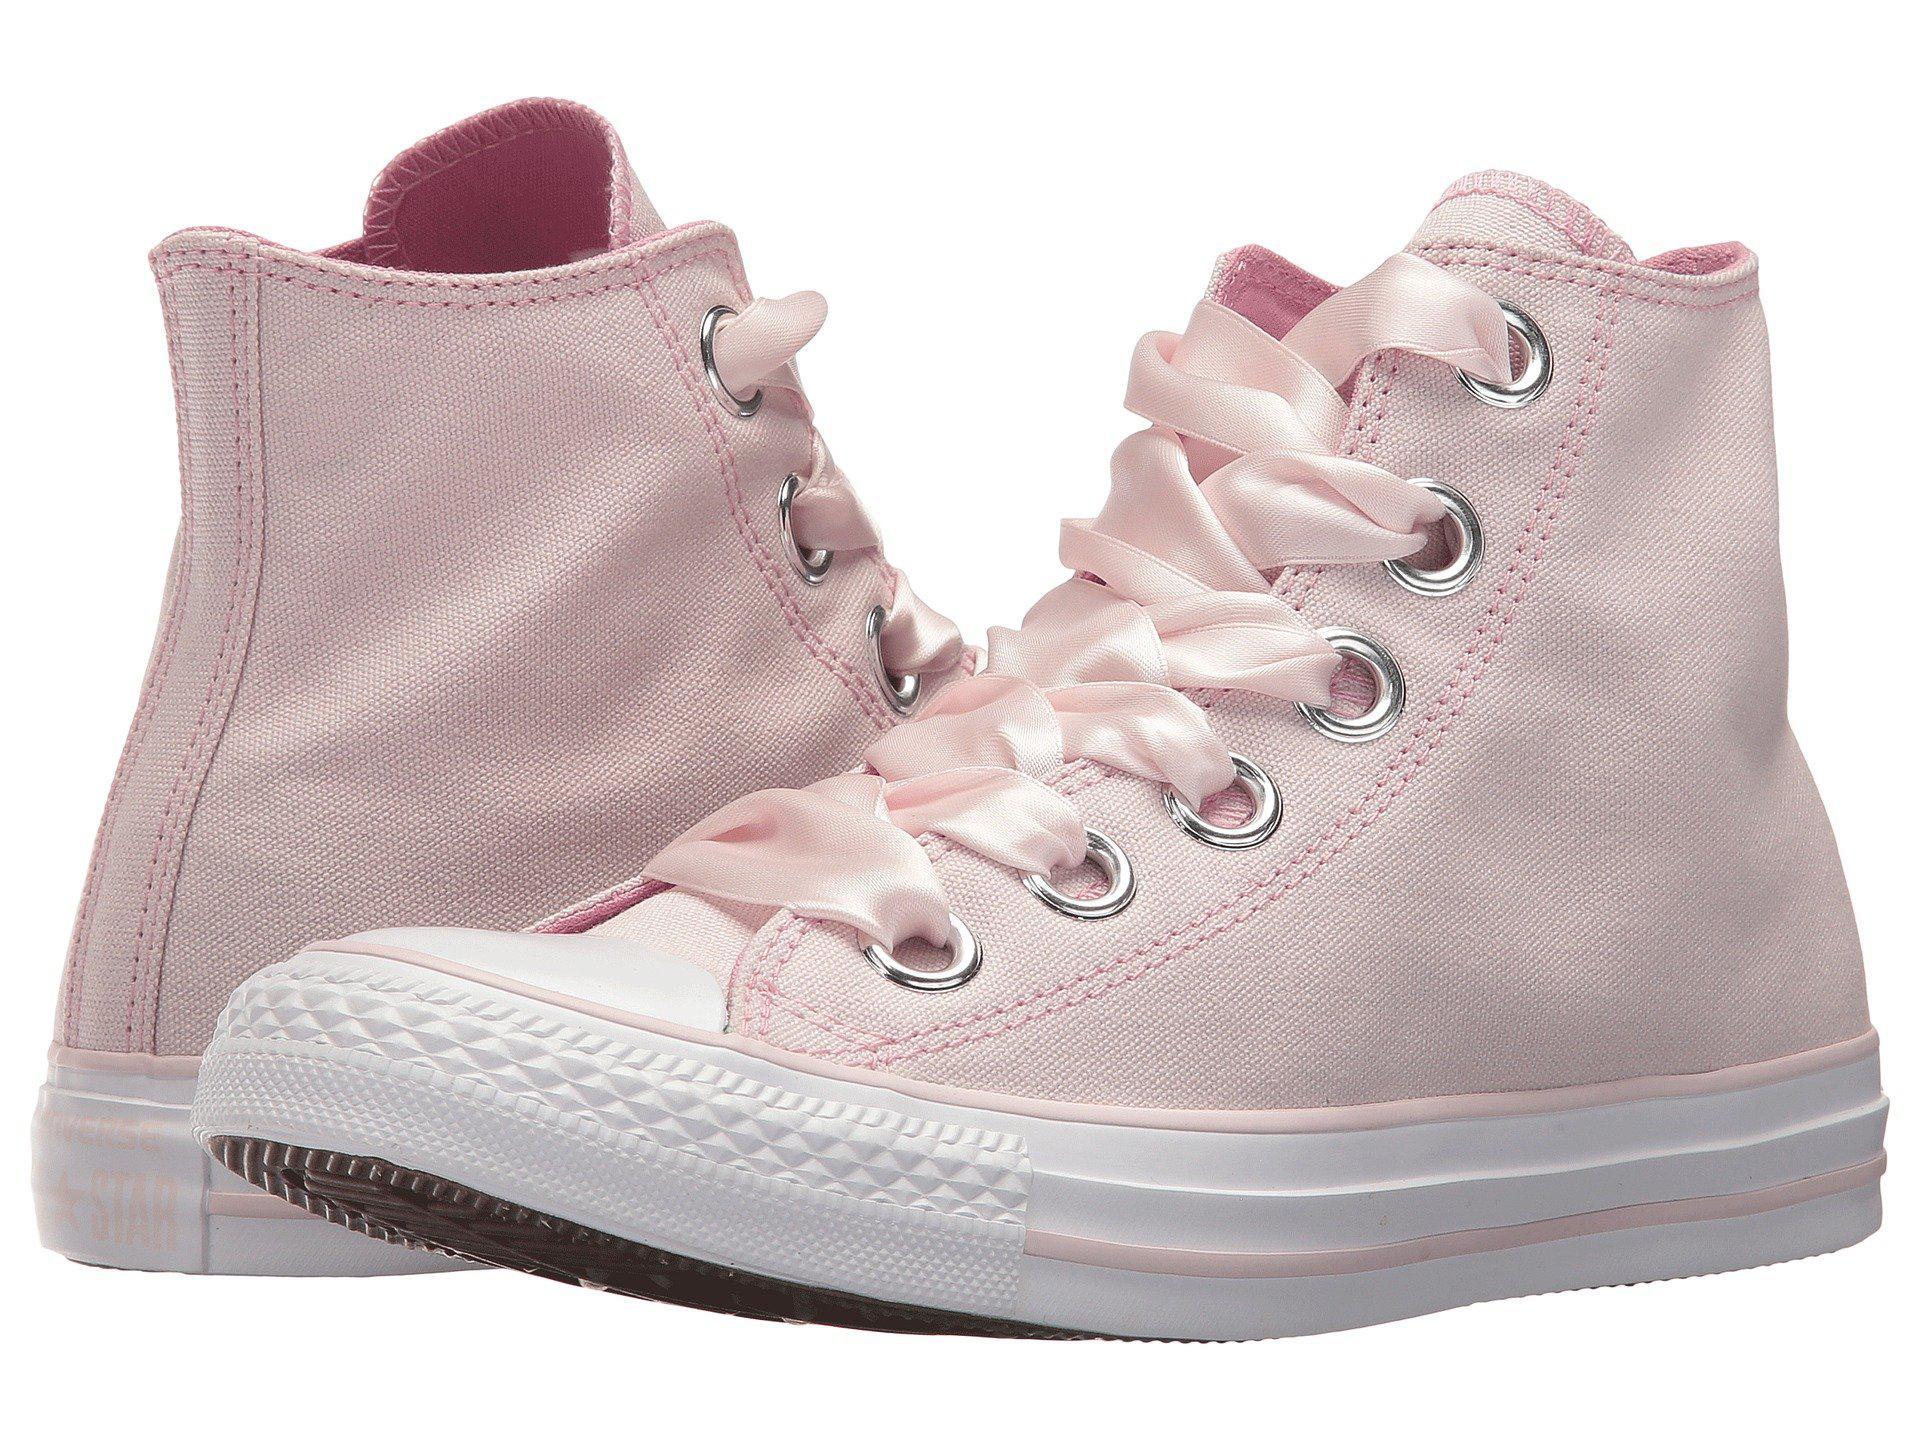 Converse Chuck Taylor® All Star Pastel